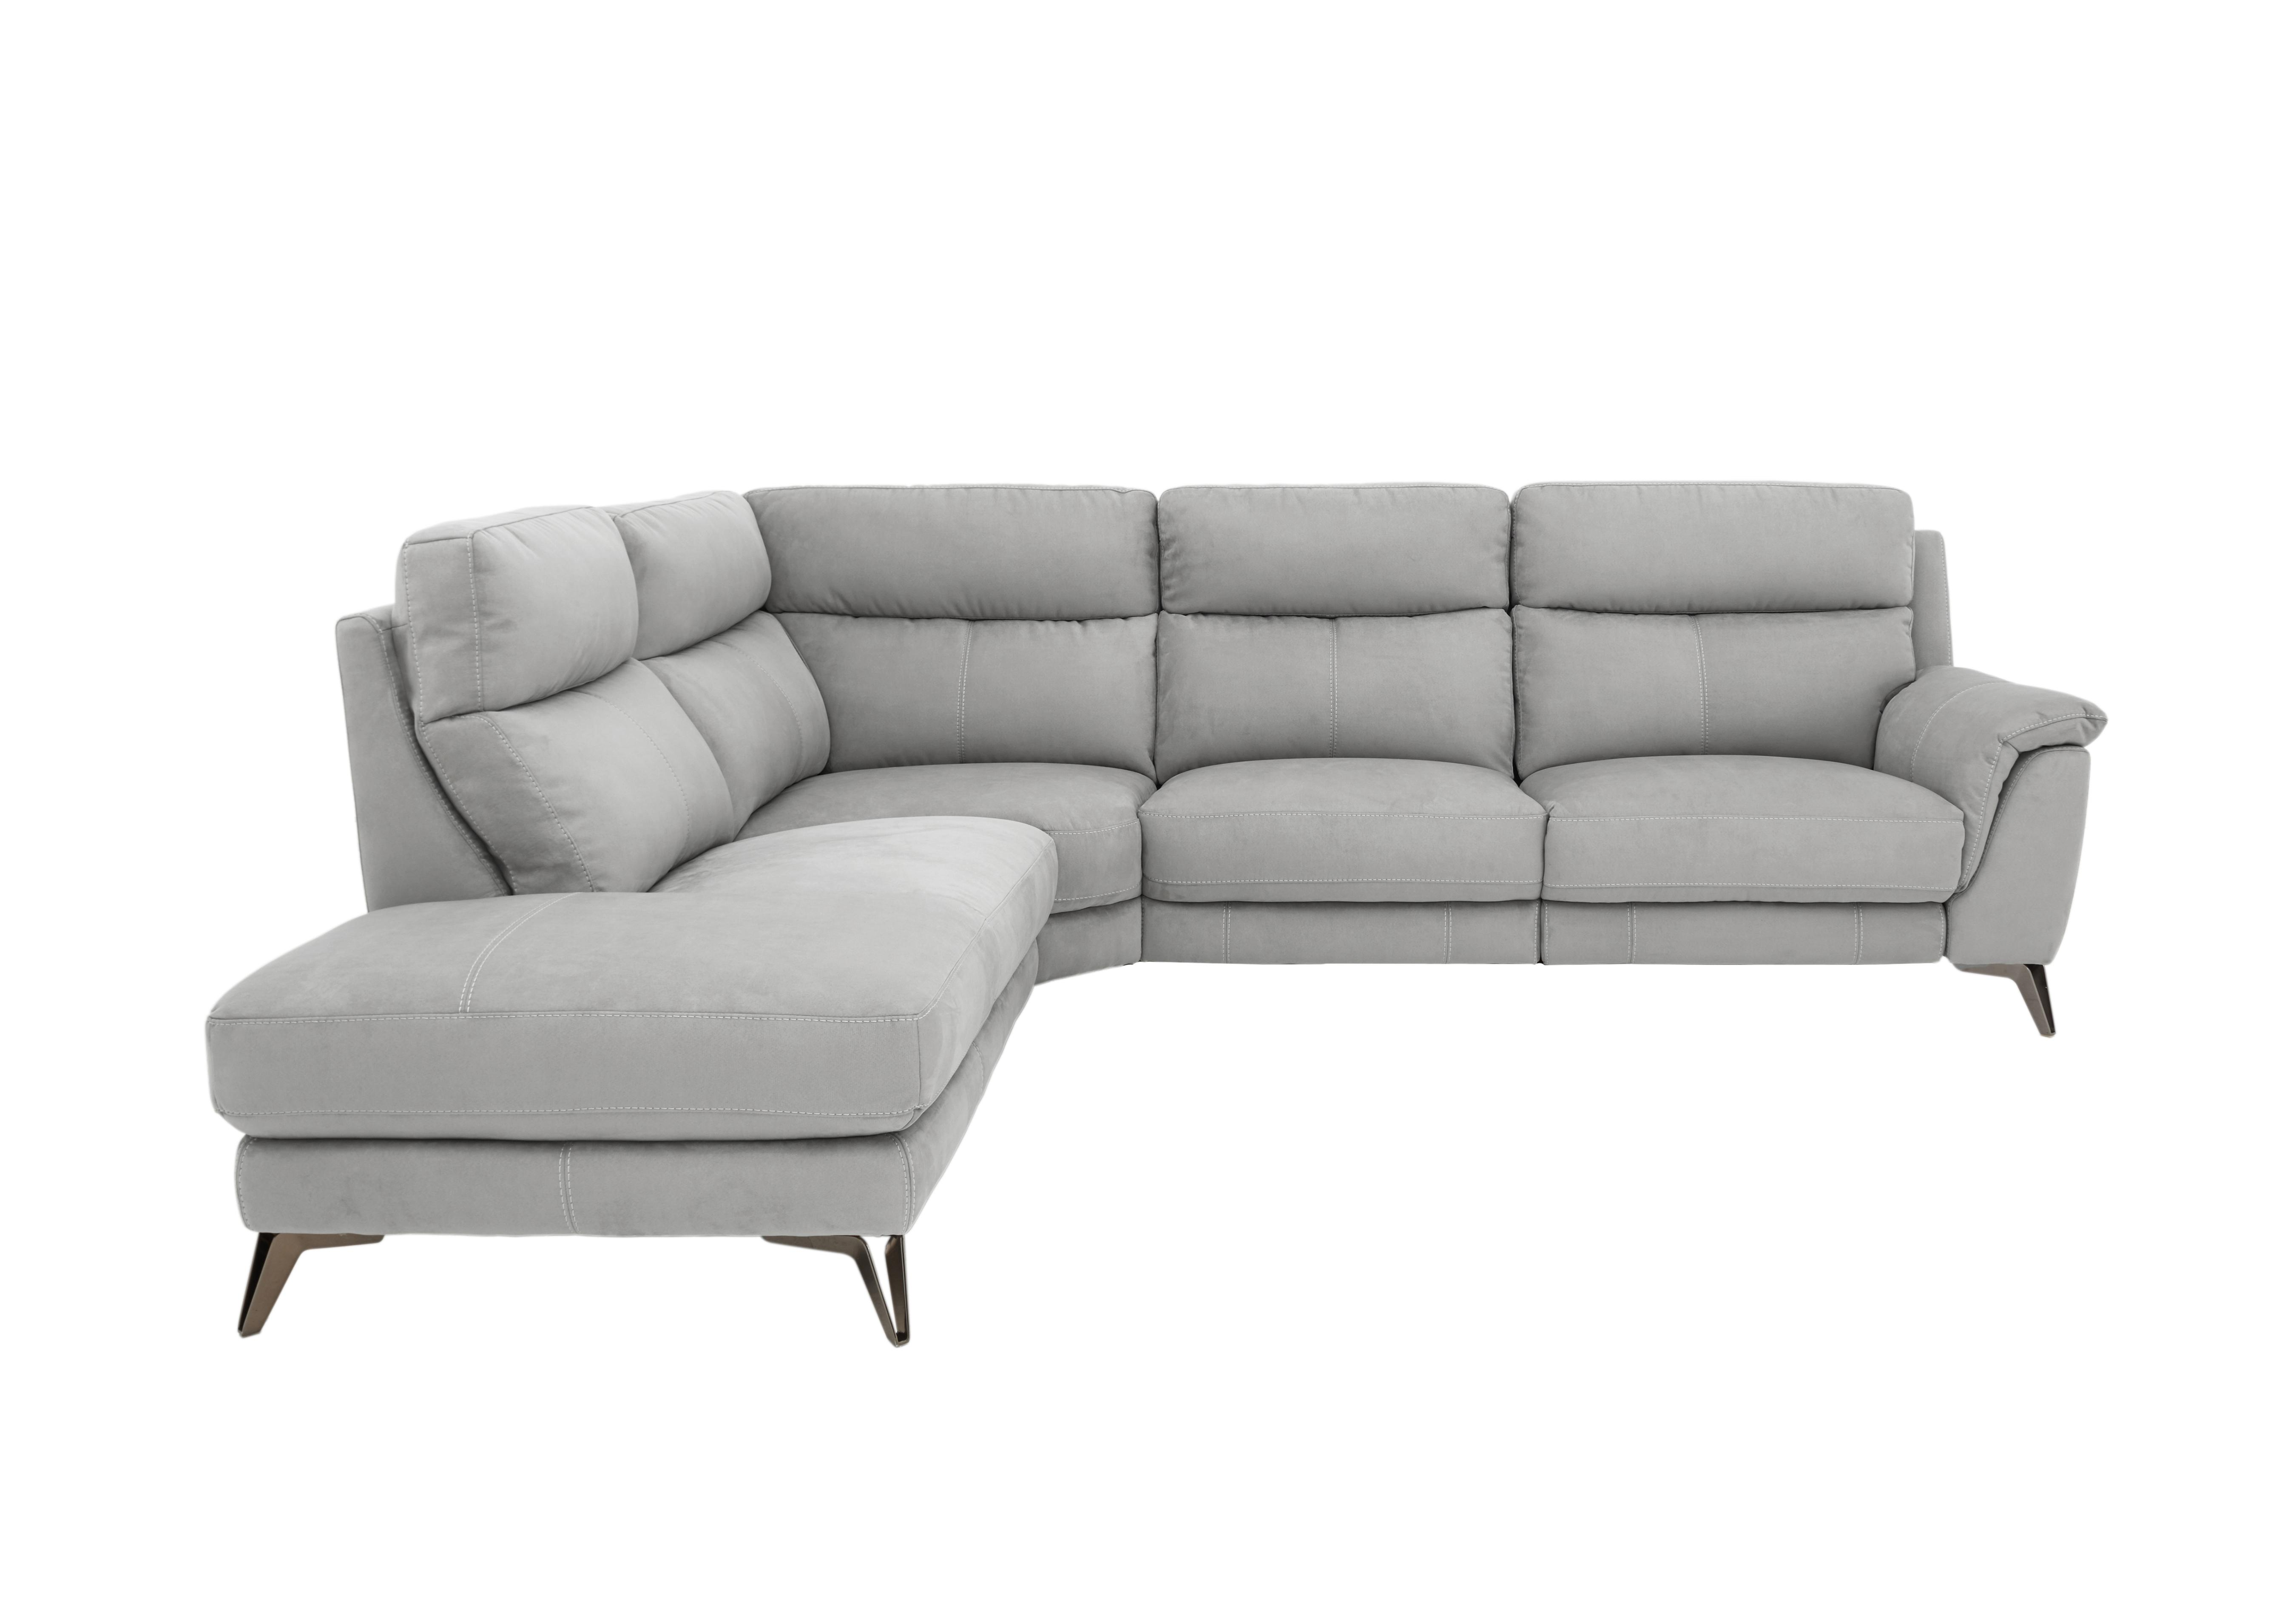 Picture of: Streamline 5 Seater Classic Back Fabric Recliner Corner Sofa Furniture Village